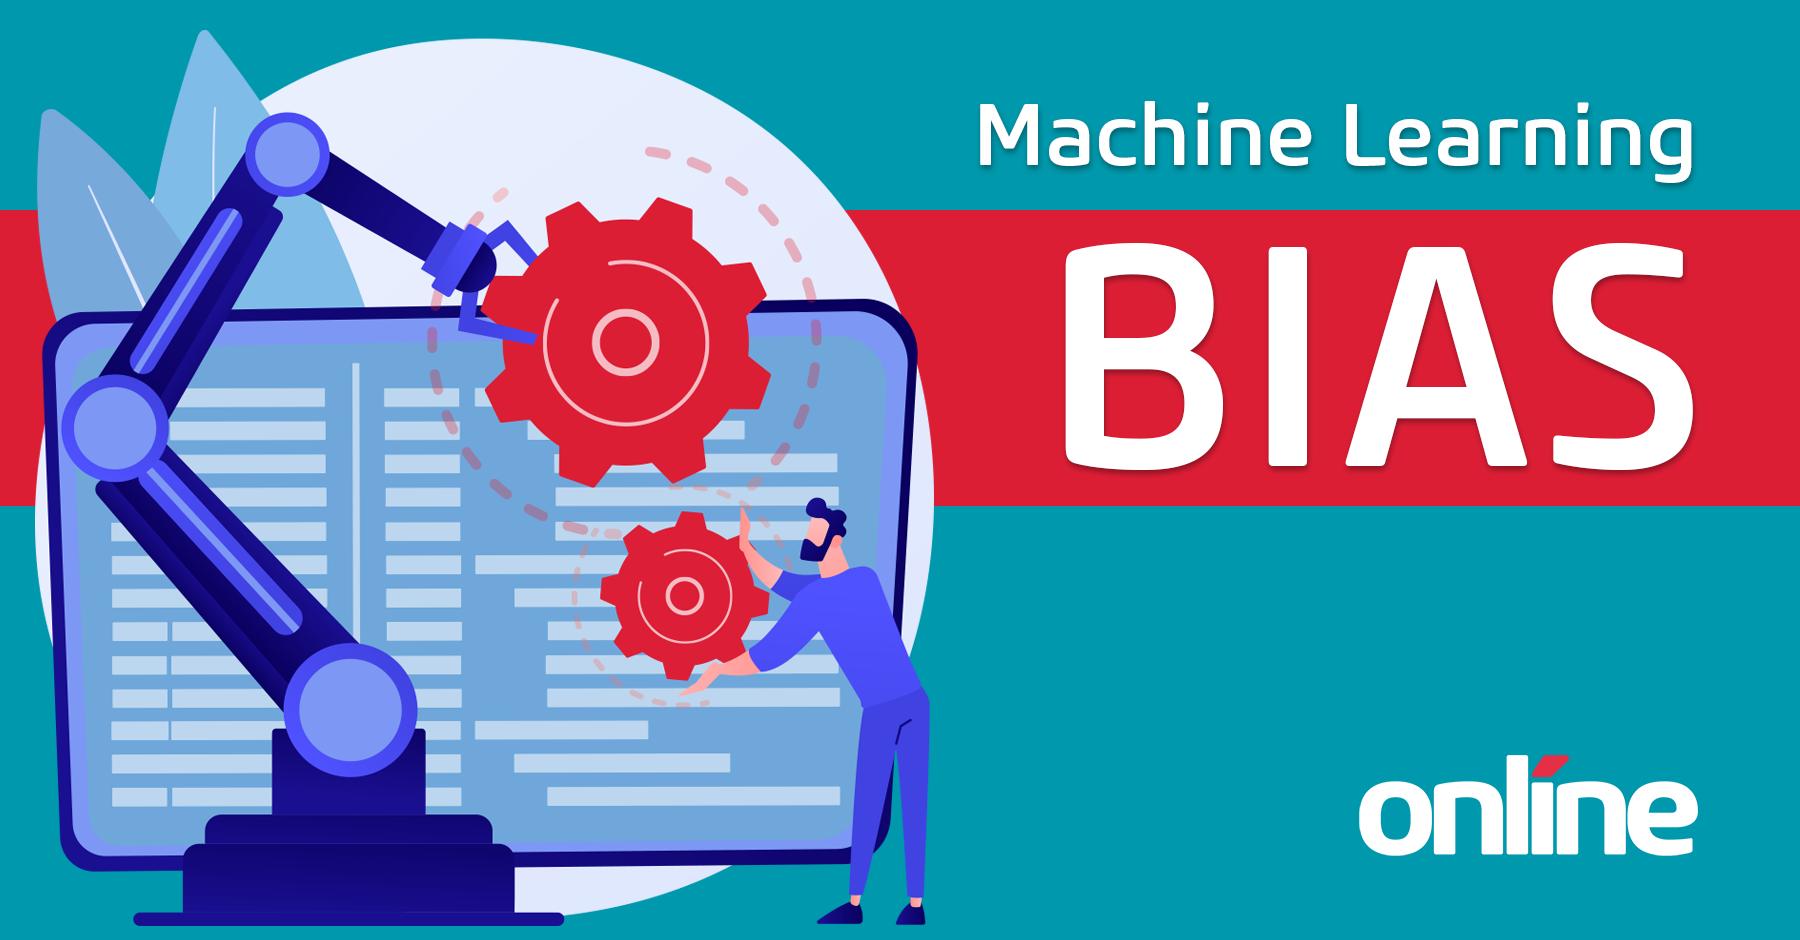 Machine Learning Bias